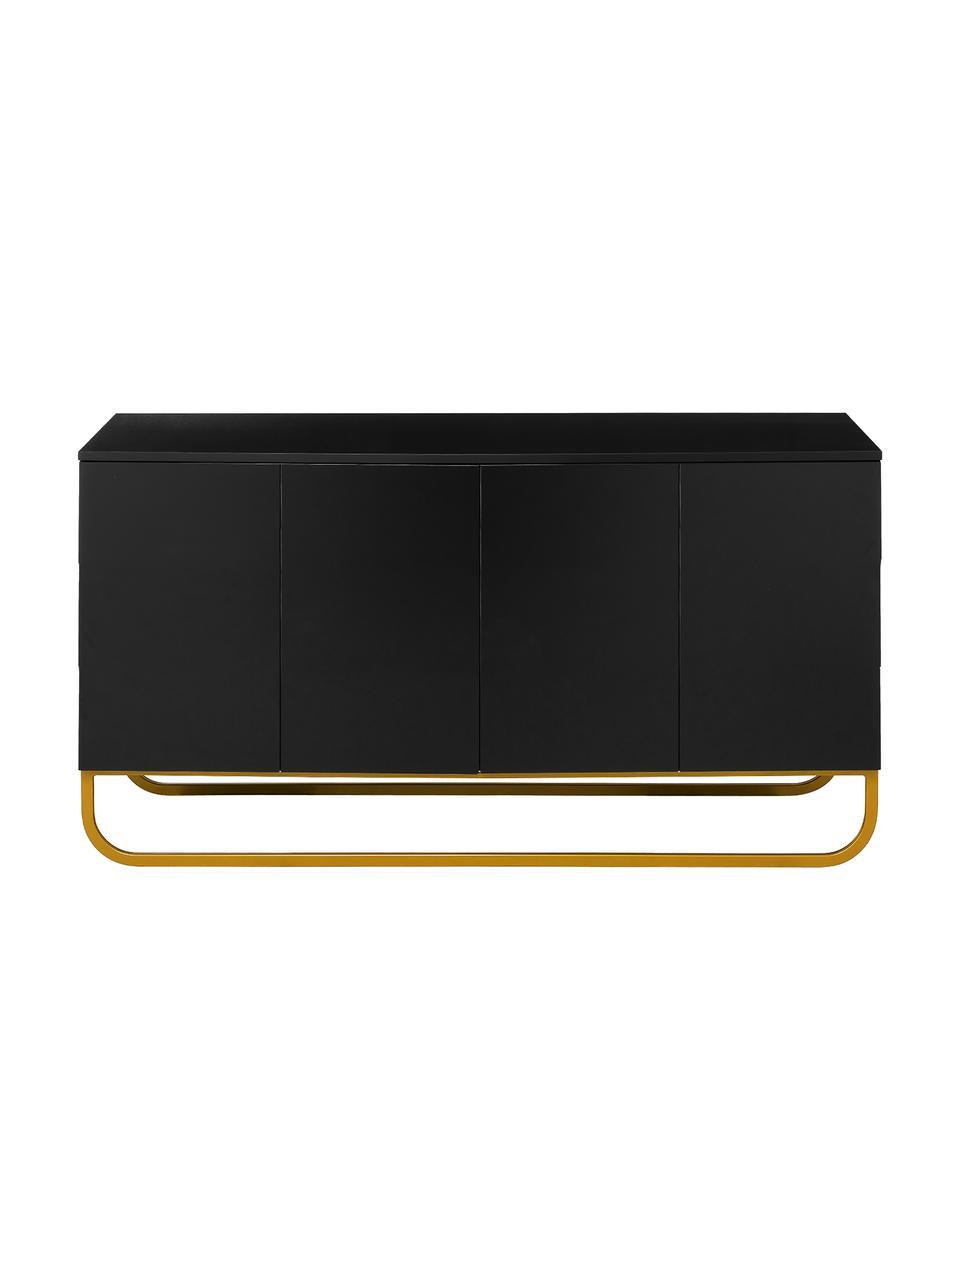 Aparador Sanford, estilo clásico, Estructura: tablero de fibras de dens, Parte trasera: tablero de fibras de desi, Patas: metal pintado en polvo, Negro, dorado, An 160 x Al 83 cm